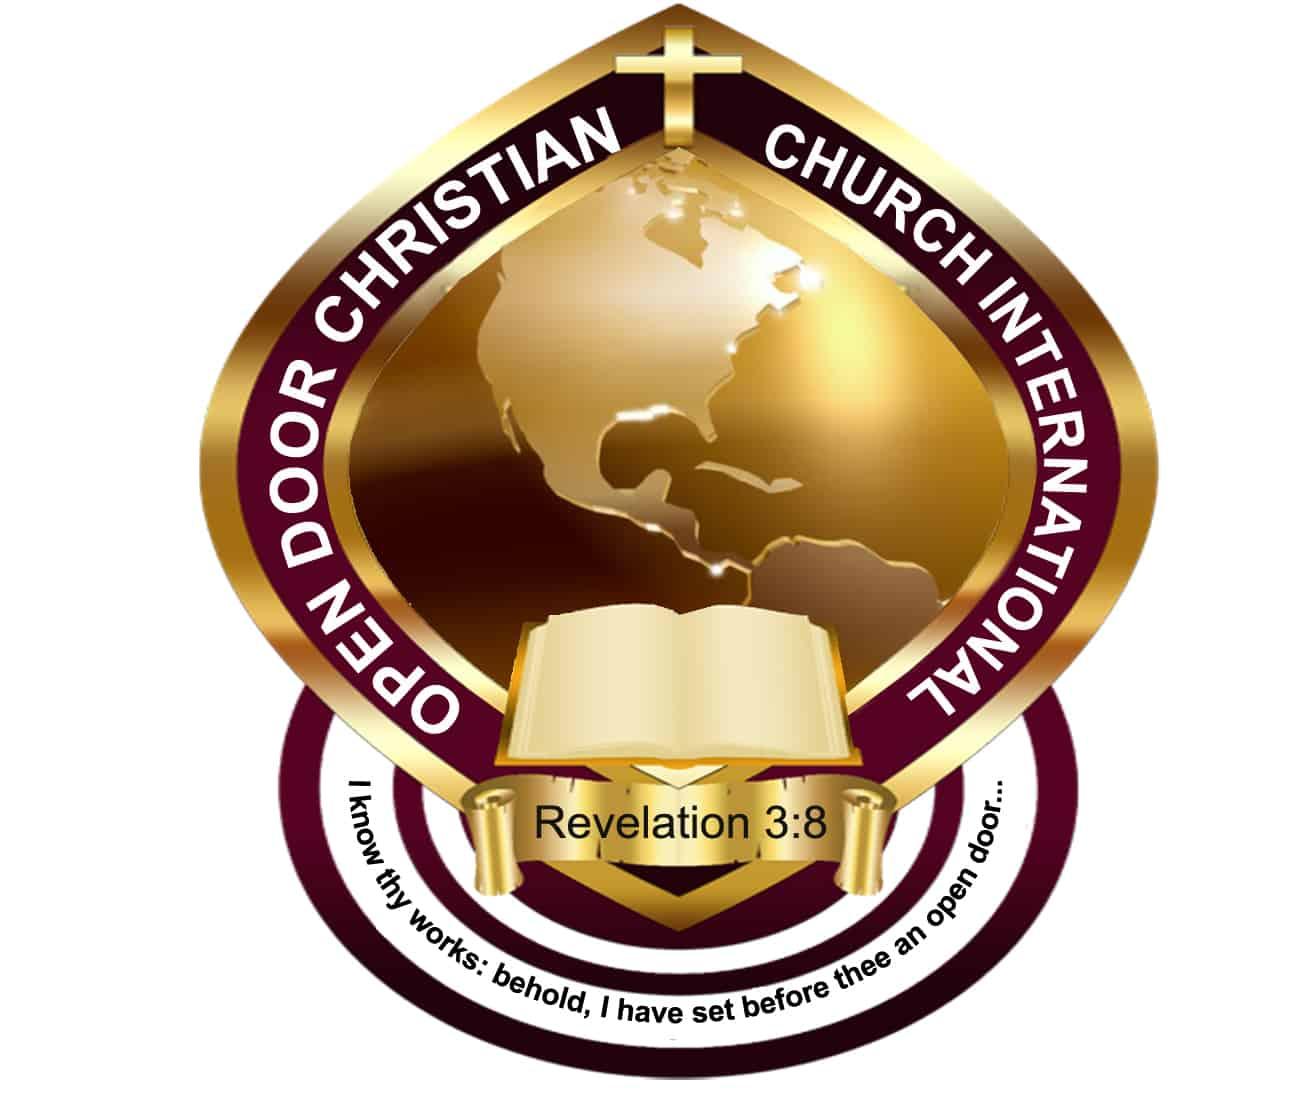 logo_crestl_05-03-2016_rev_3